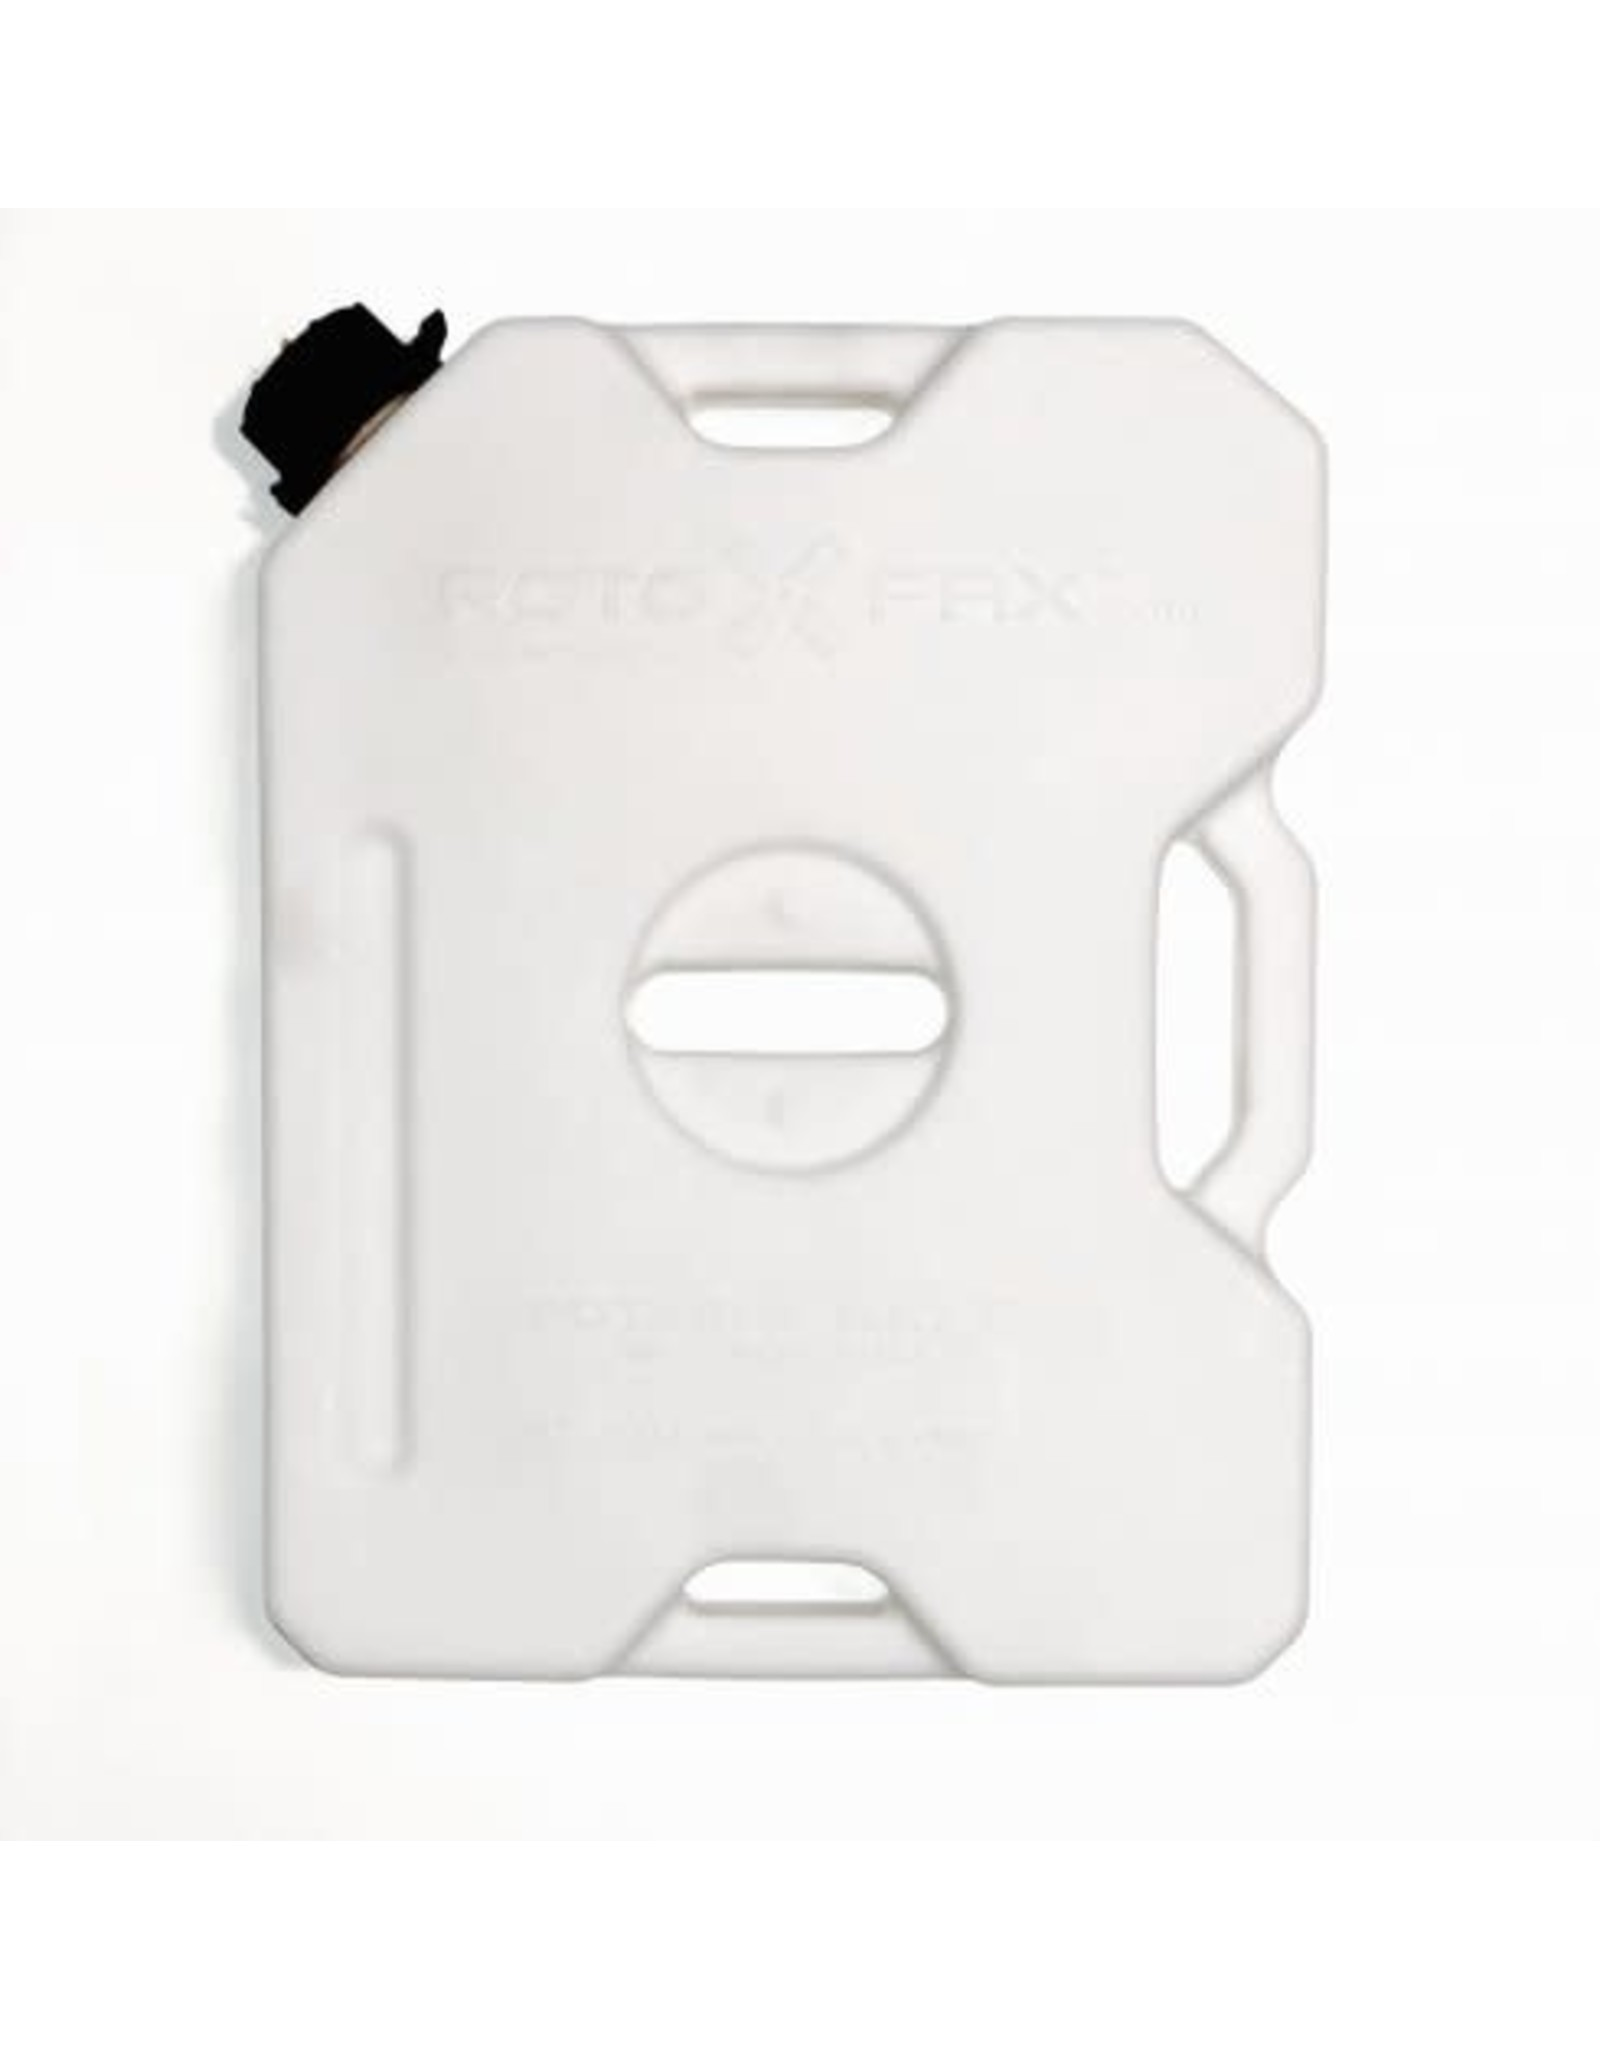 RotopaX 2 Gallon Water Gen 2